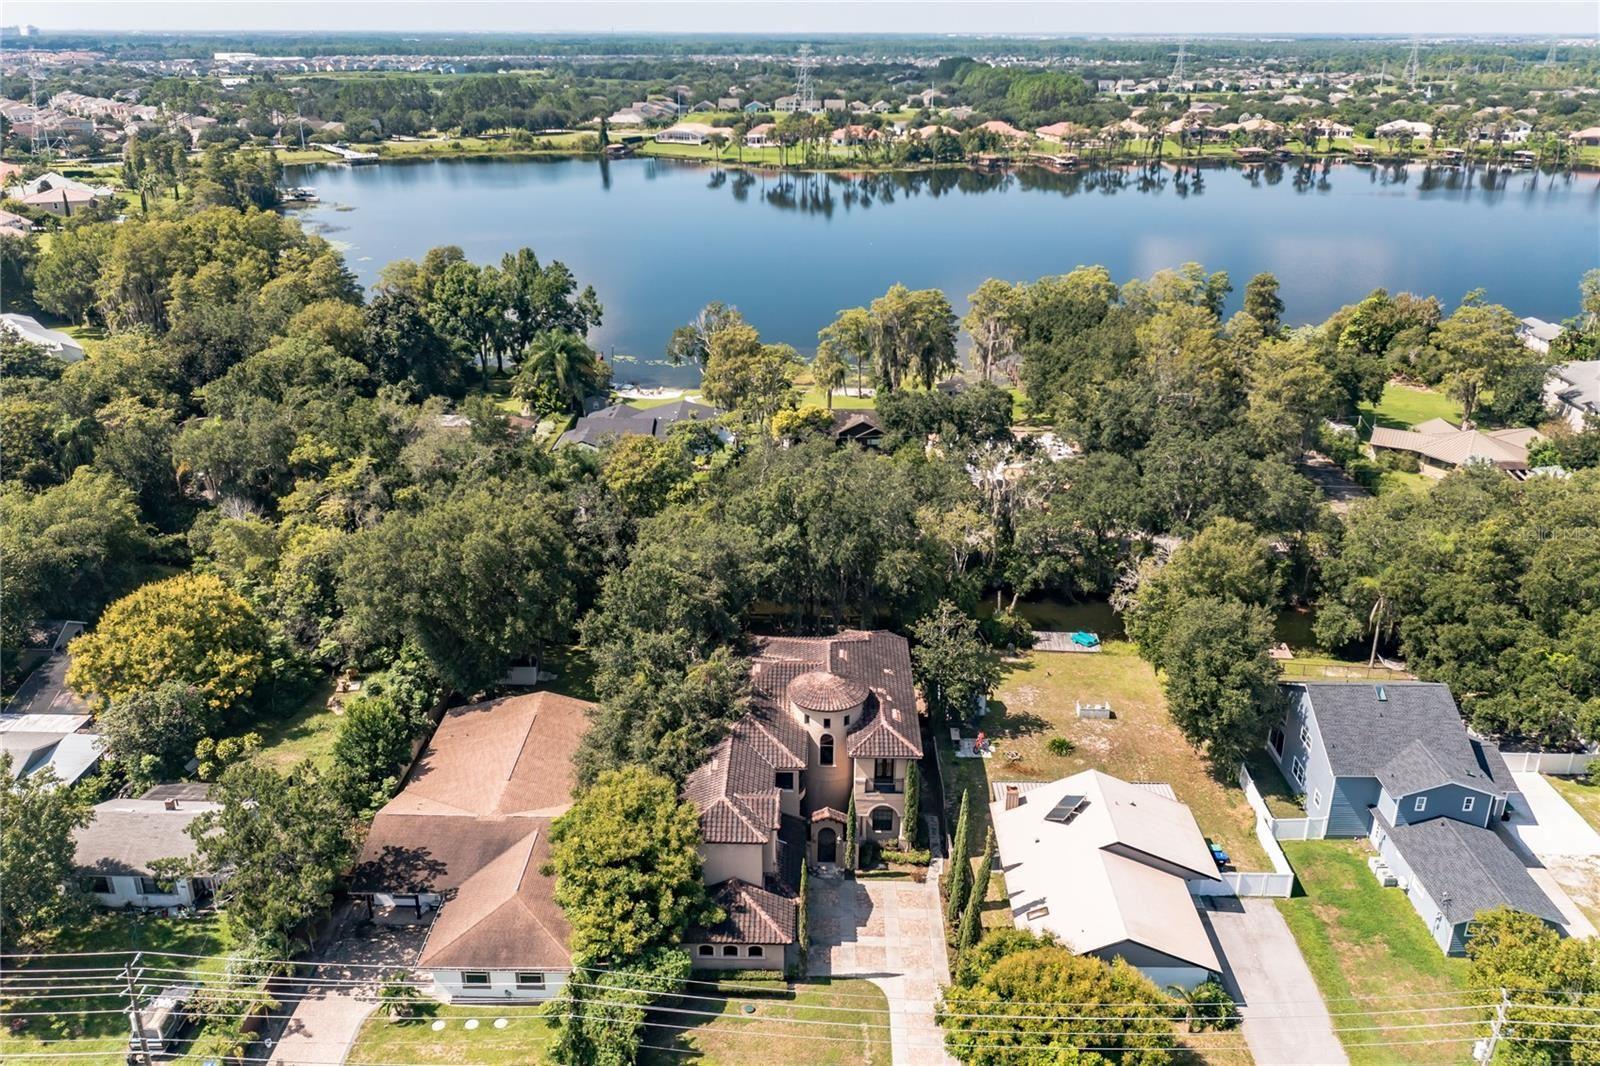 Photo of 6632 SAWYER SHORES LANE, WINDERMERE, FL 34786 (MLS # O5975042)